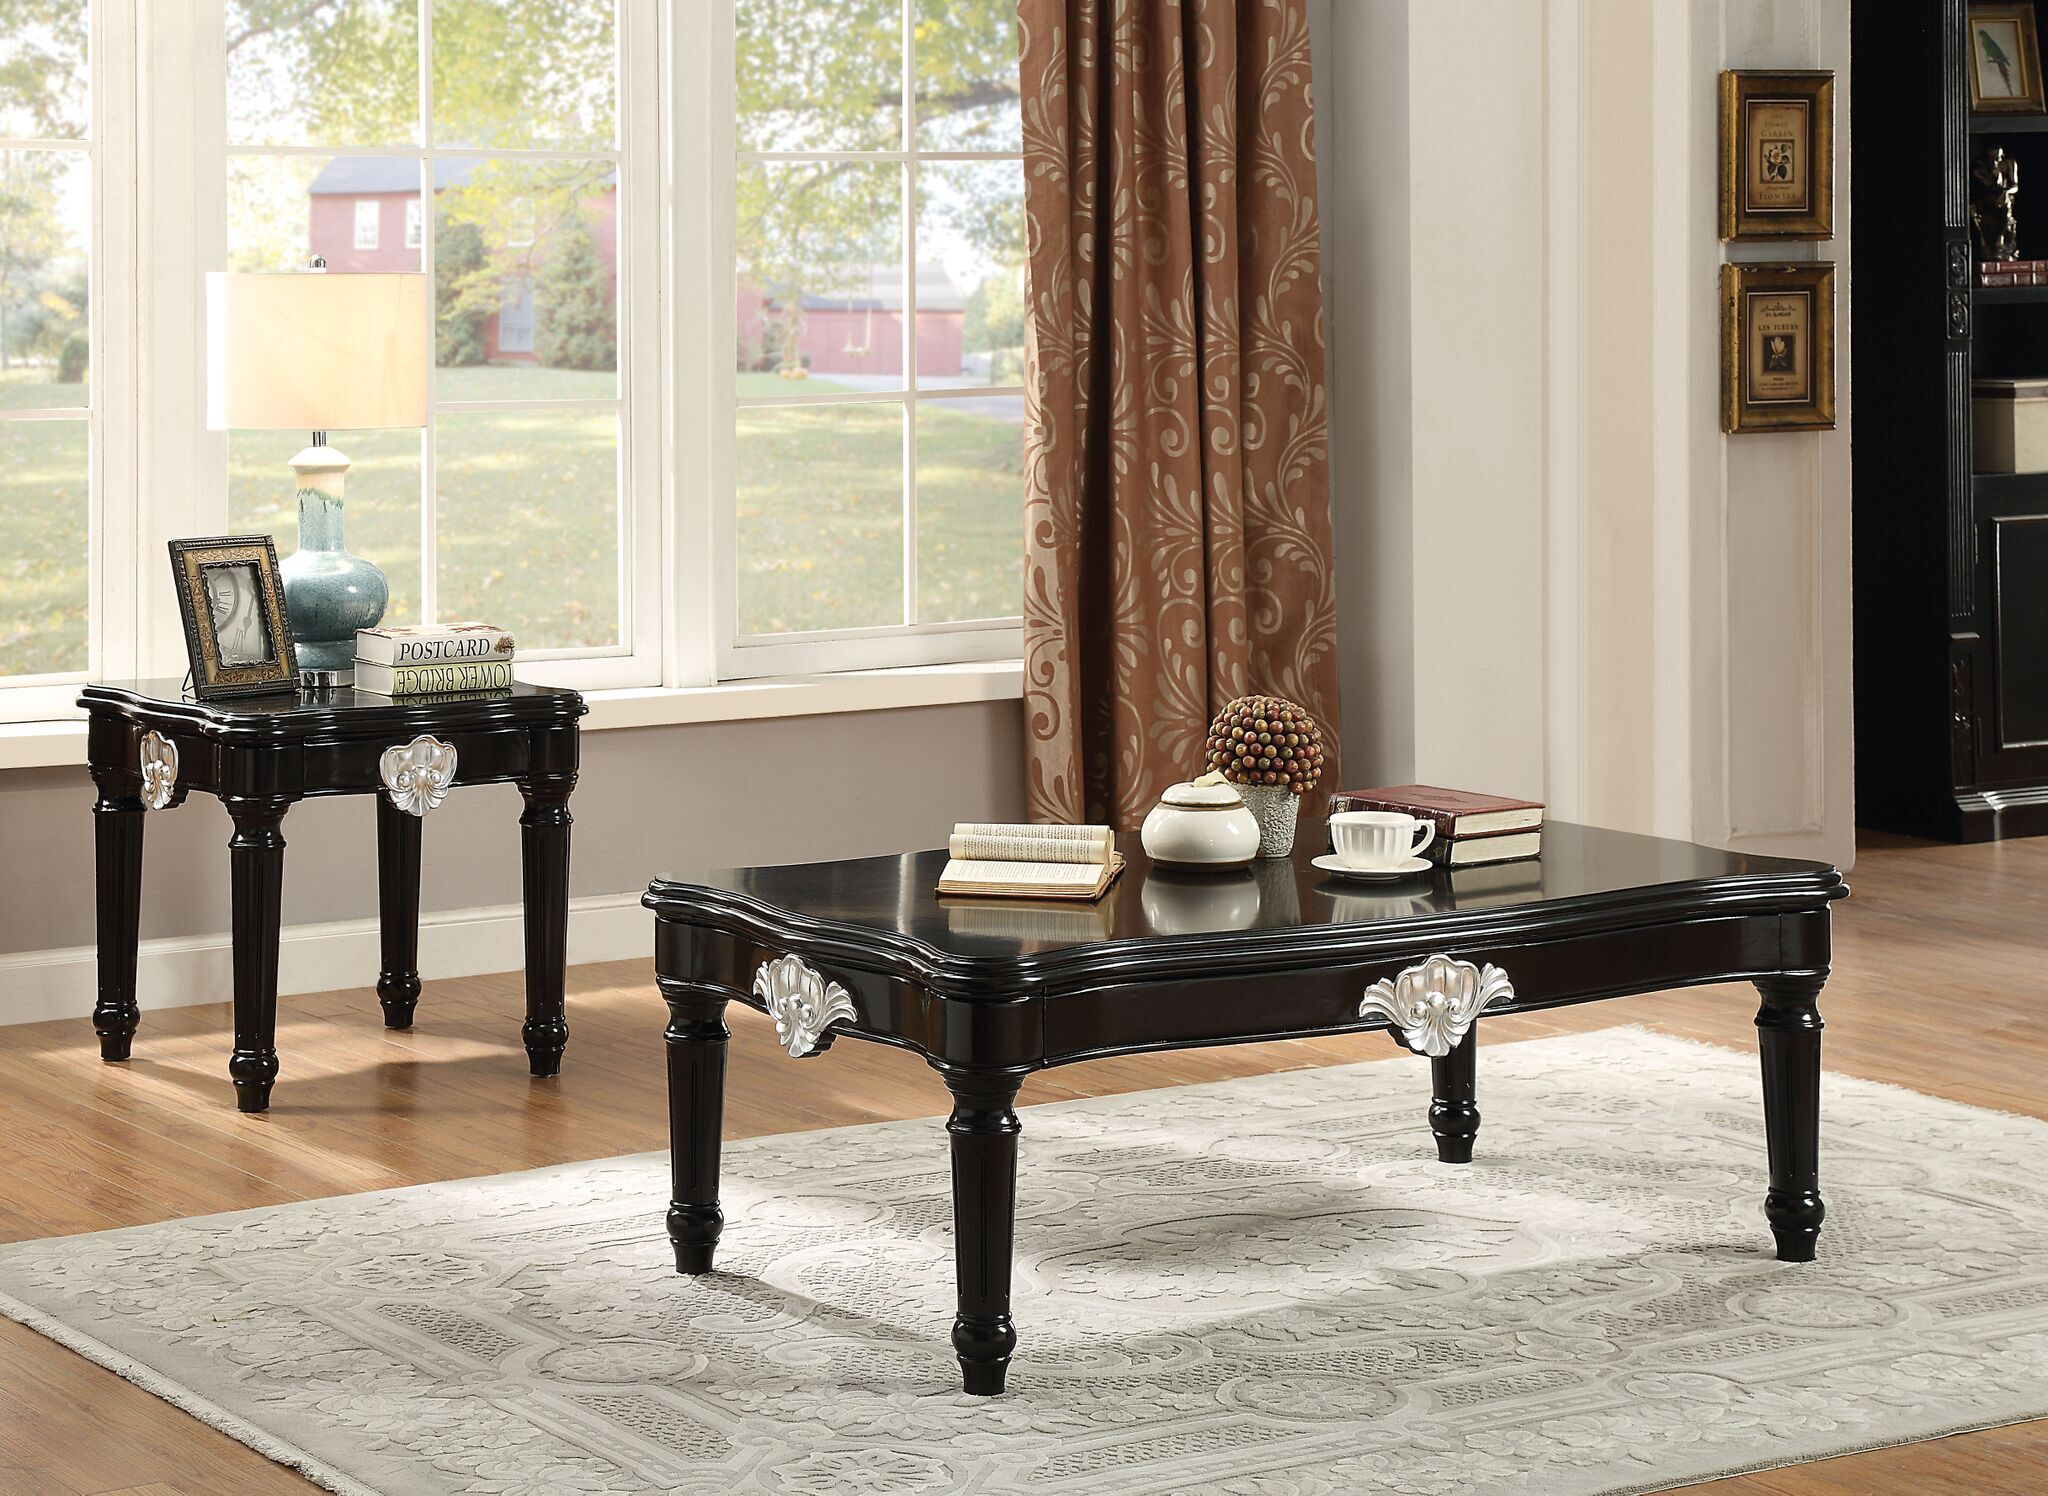 Rylance 2 Piece Rectangle Coffee Table Set